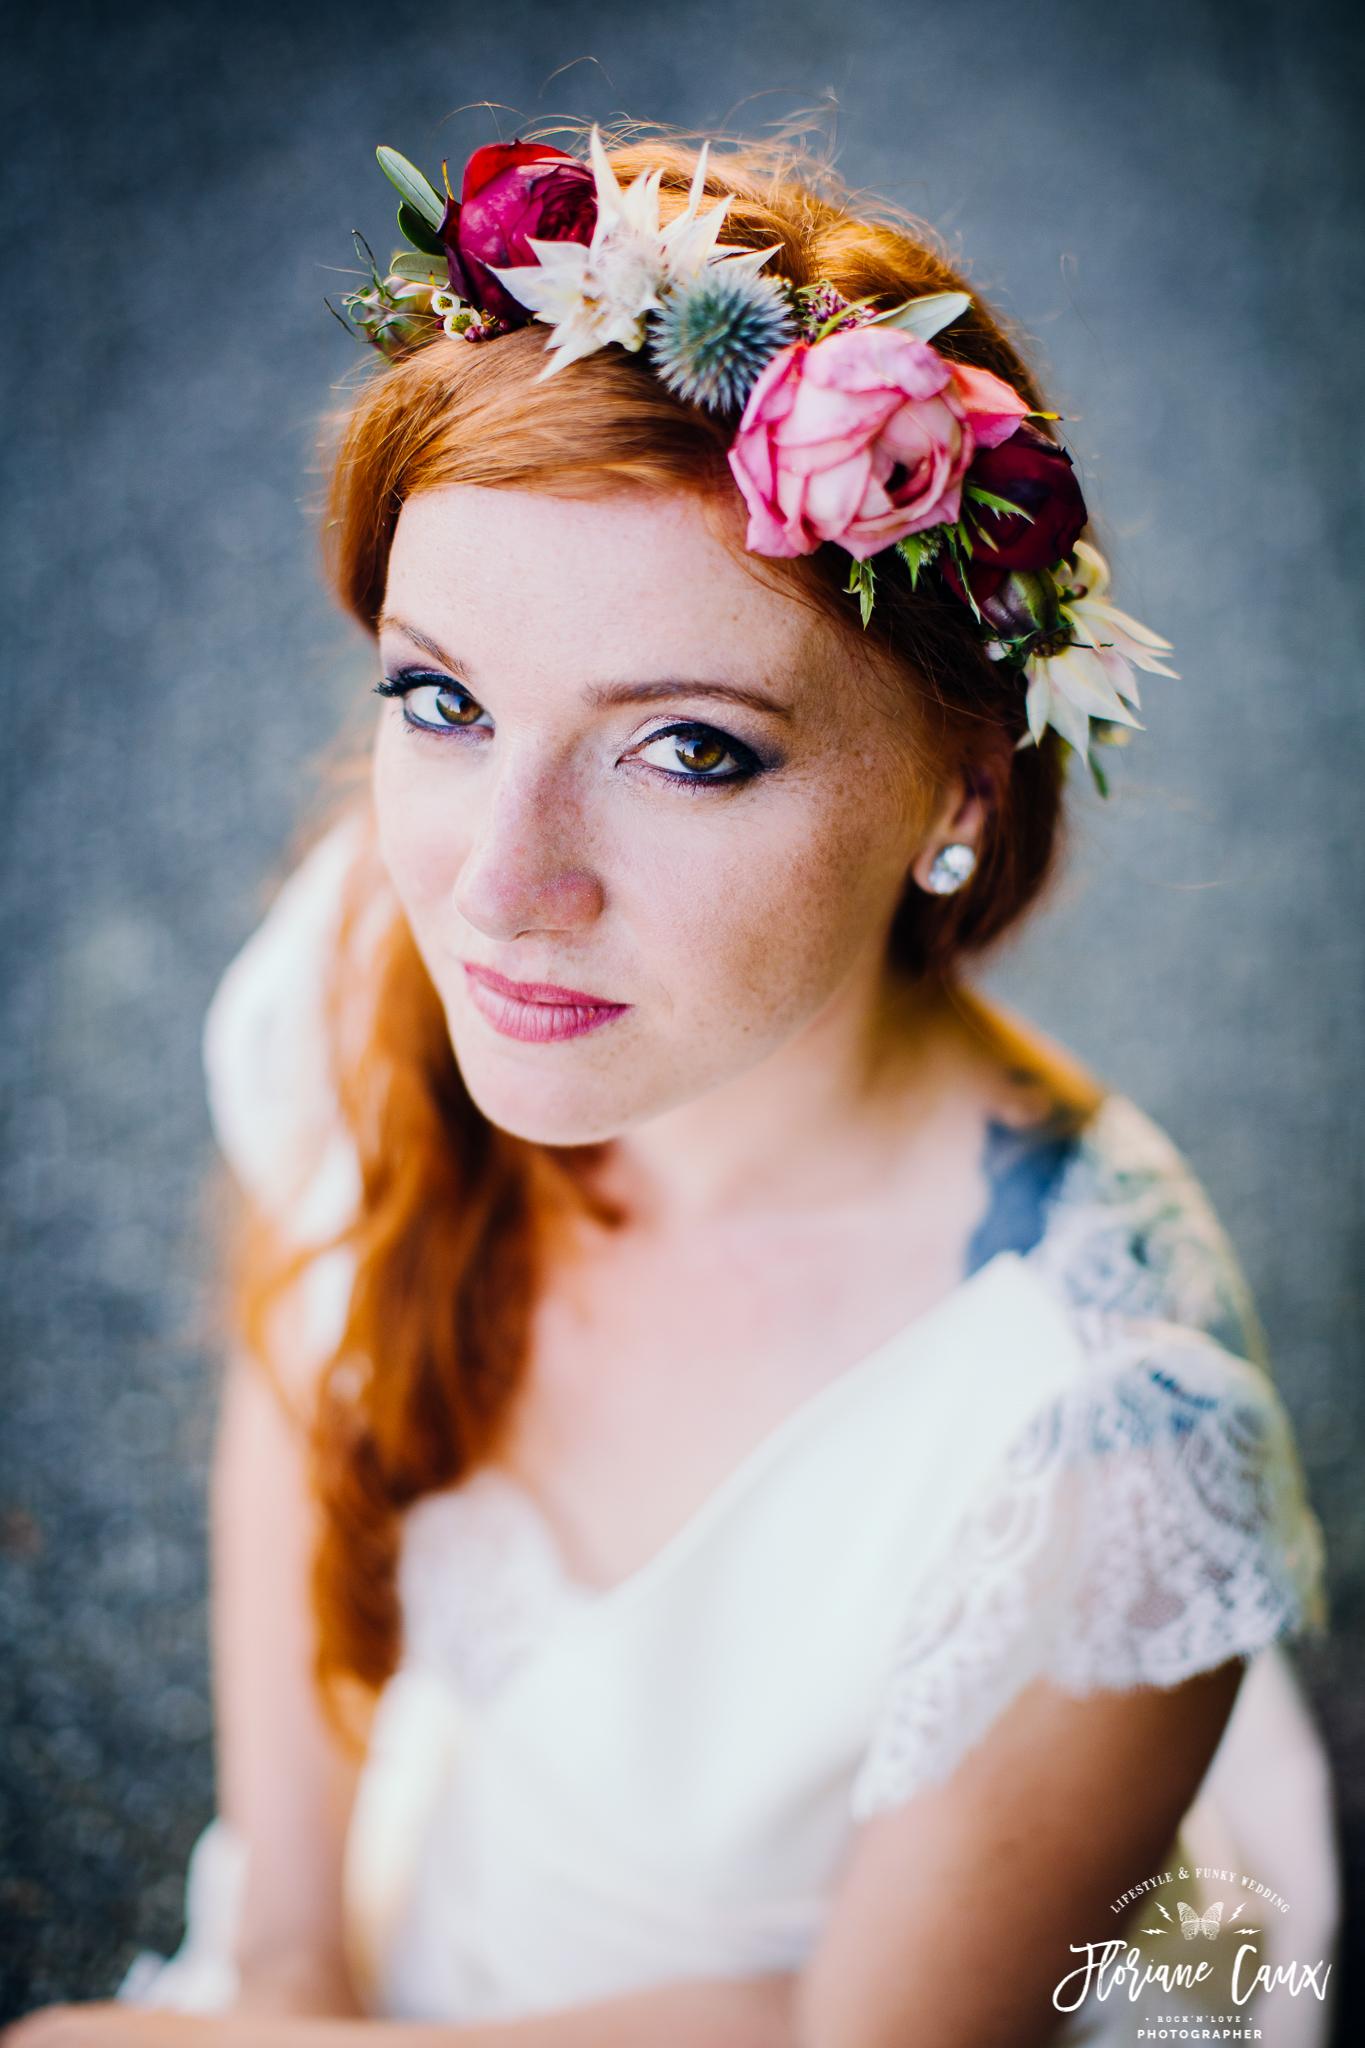 photographe-mariage-toulouse-rocknroll-maries-tatoues-floriane-caux-72